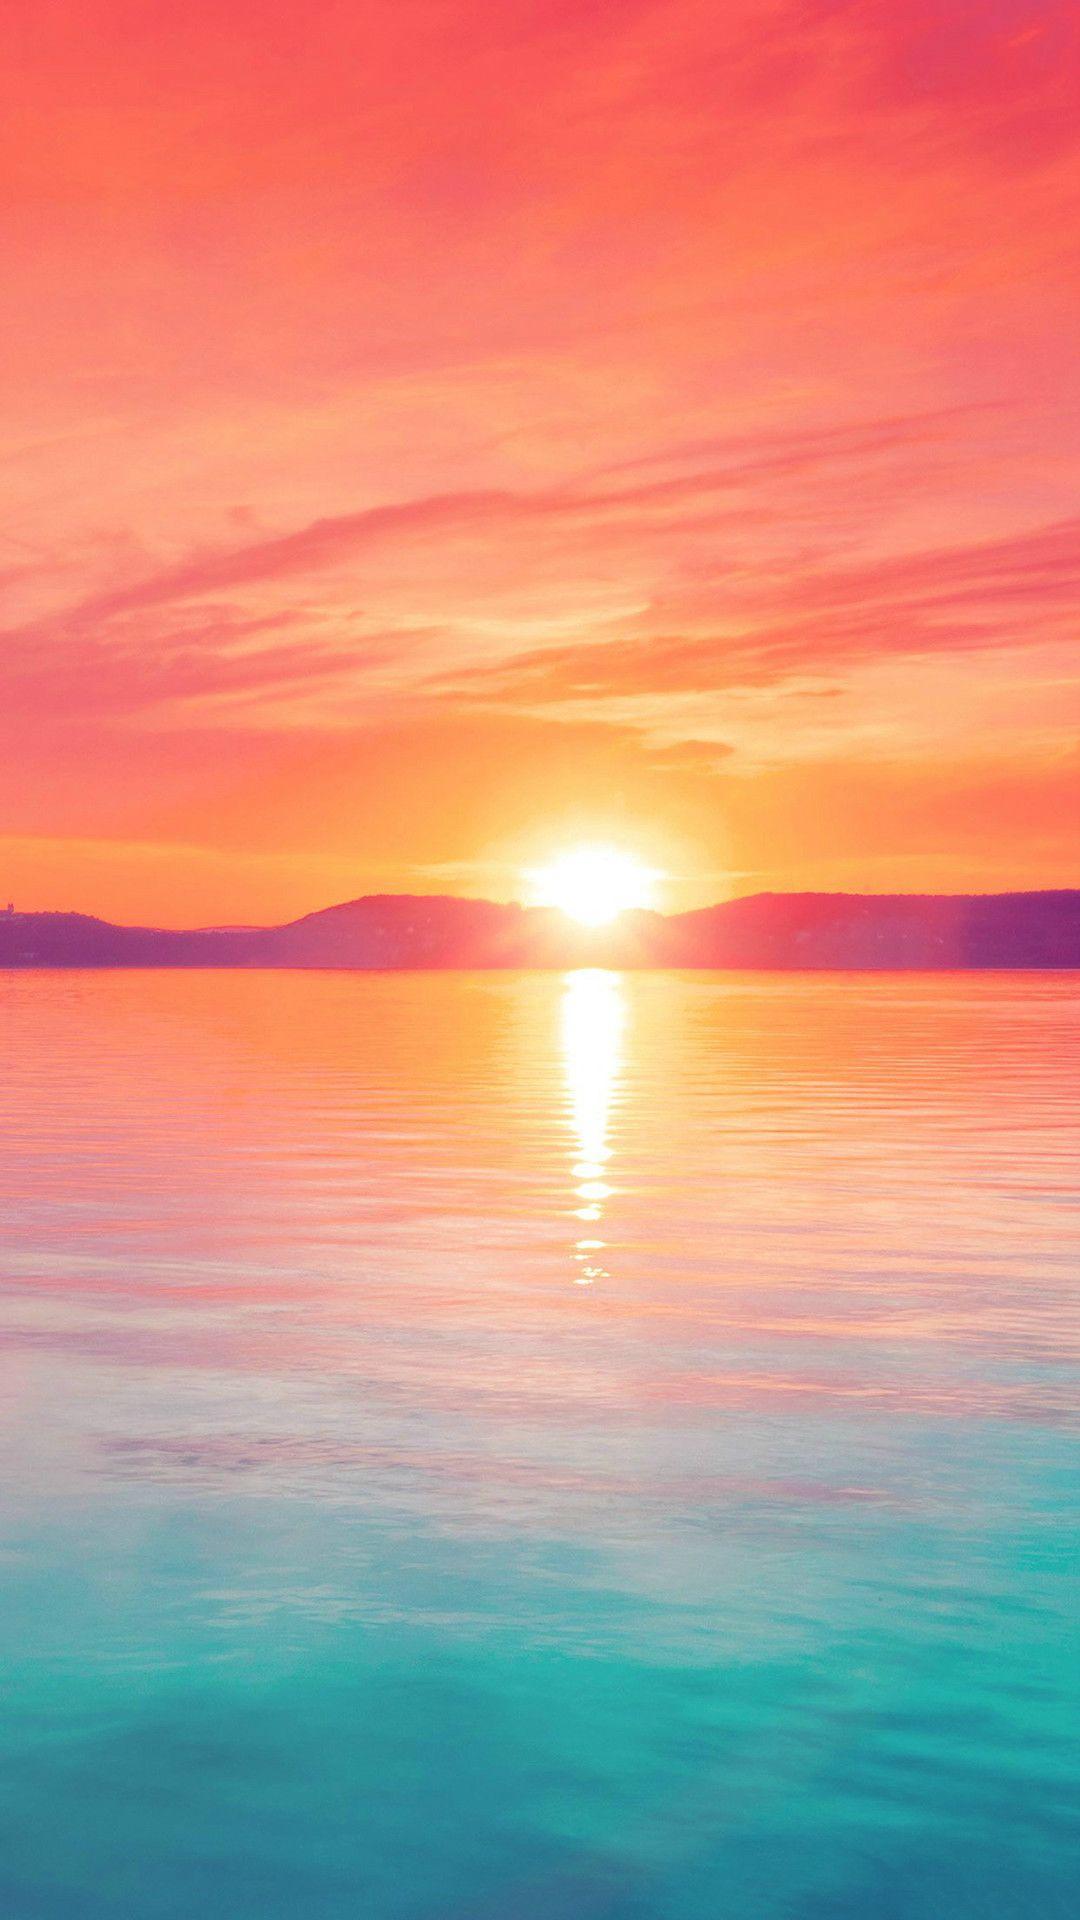 Beautiful Sunset Iphone Wallpapers Top Free Beautiful